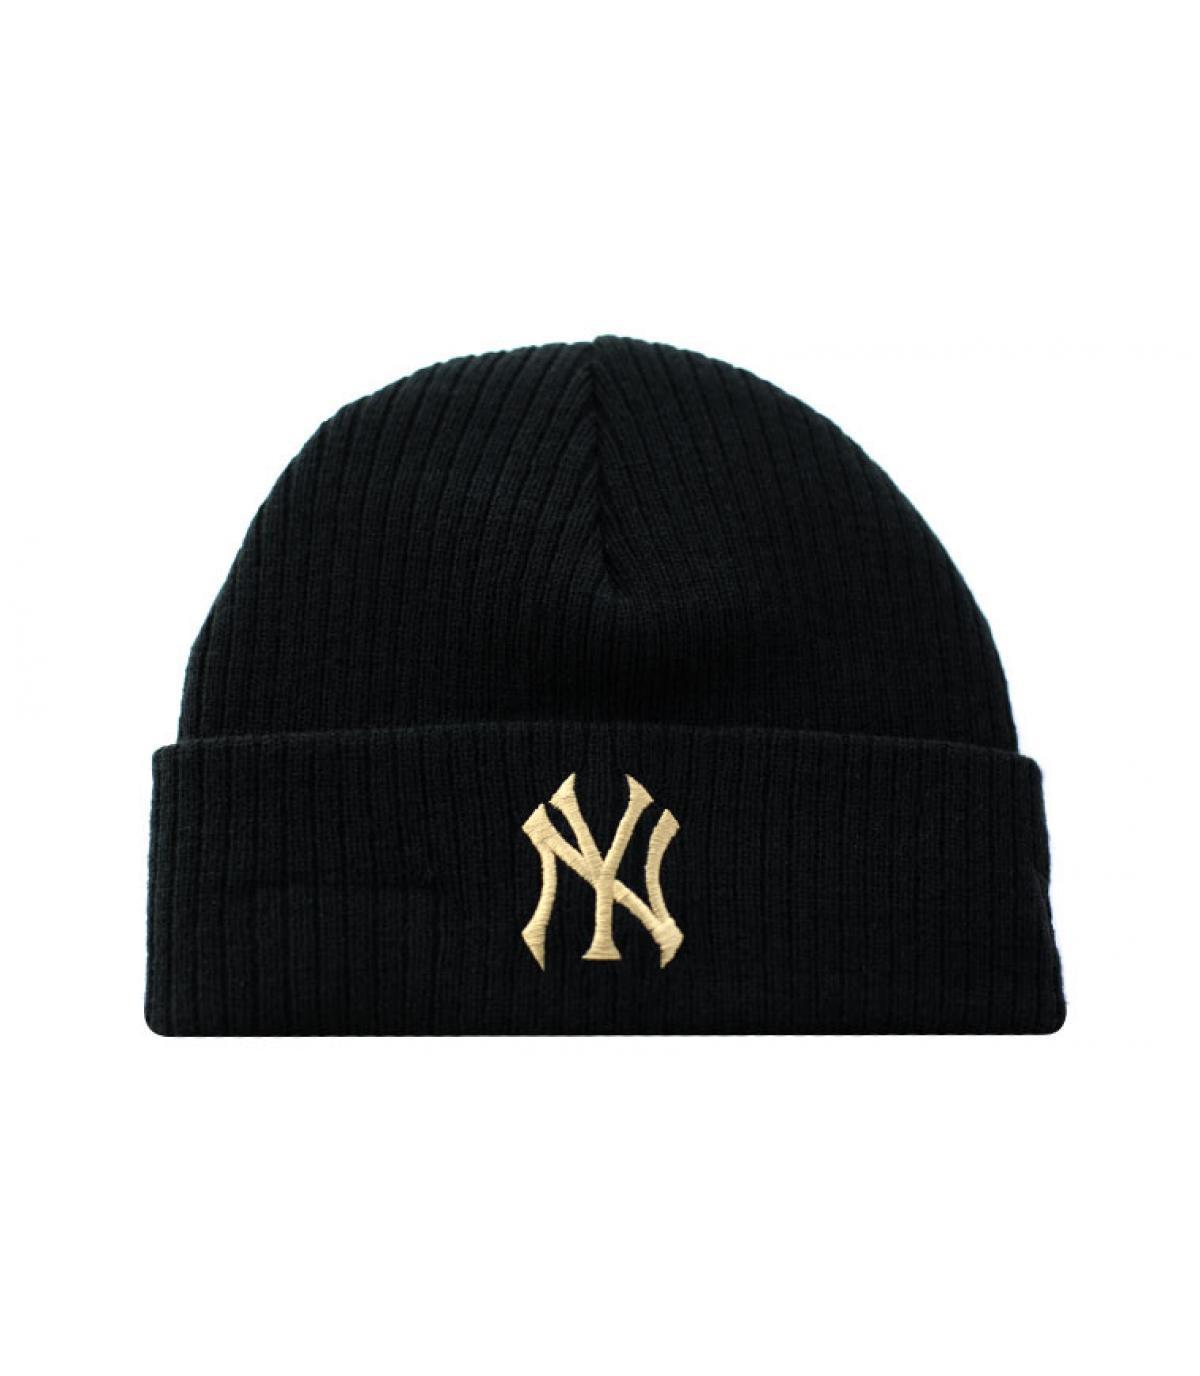 Dettagli Club Coop Knit NY black khaki - image 2